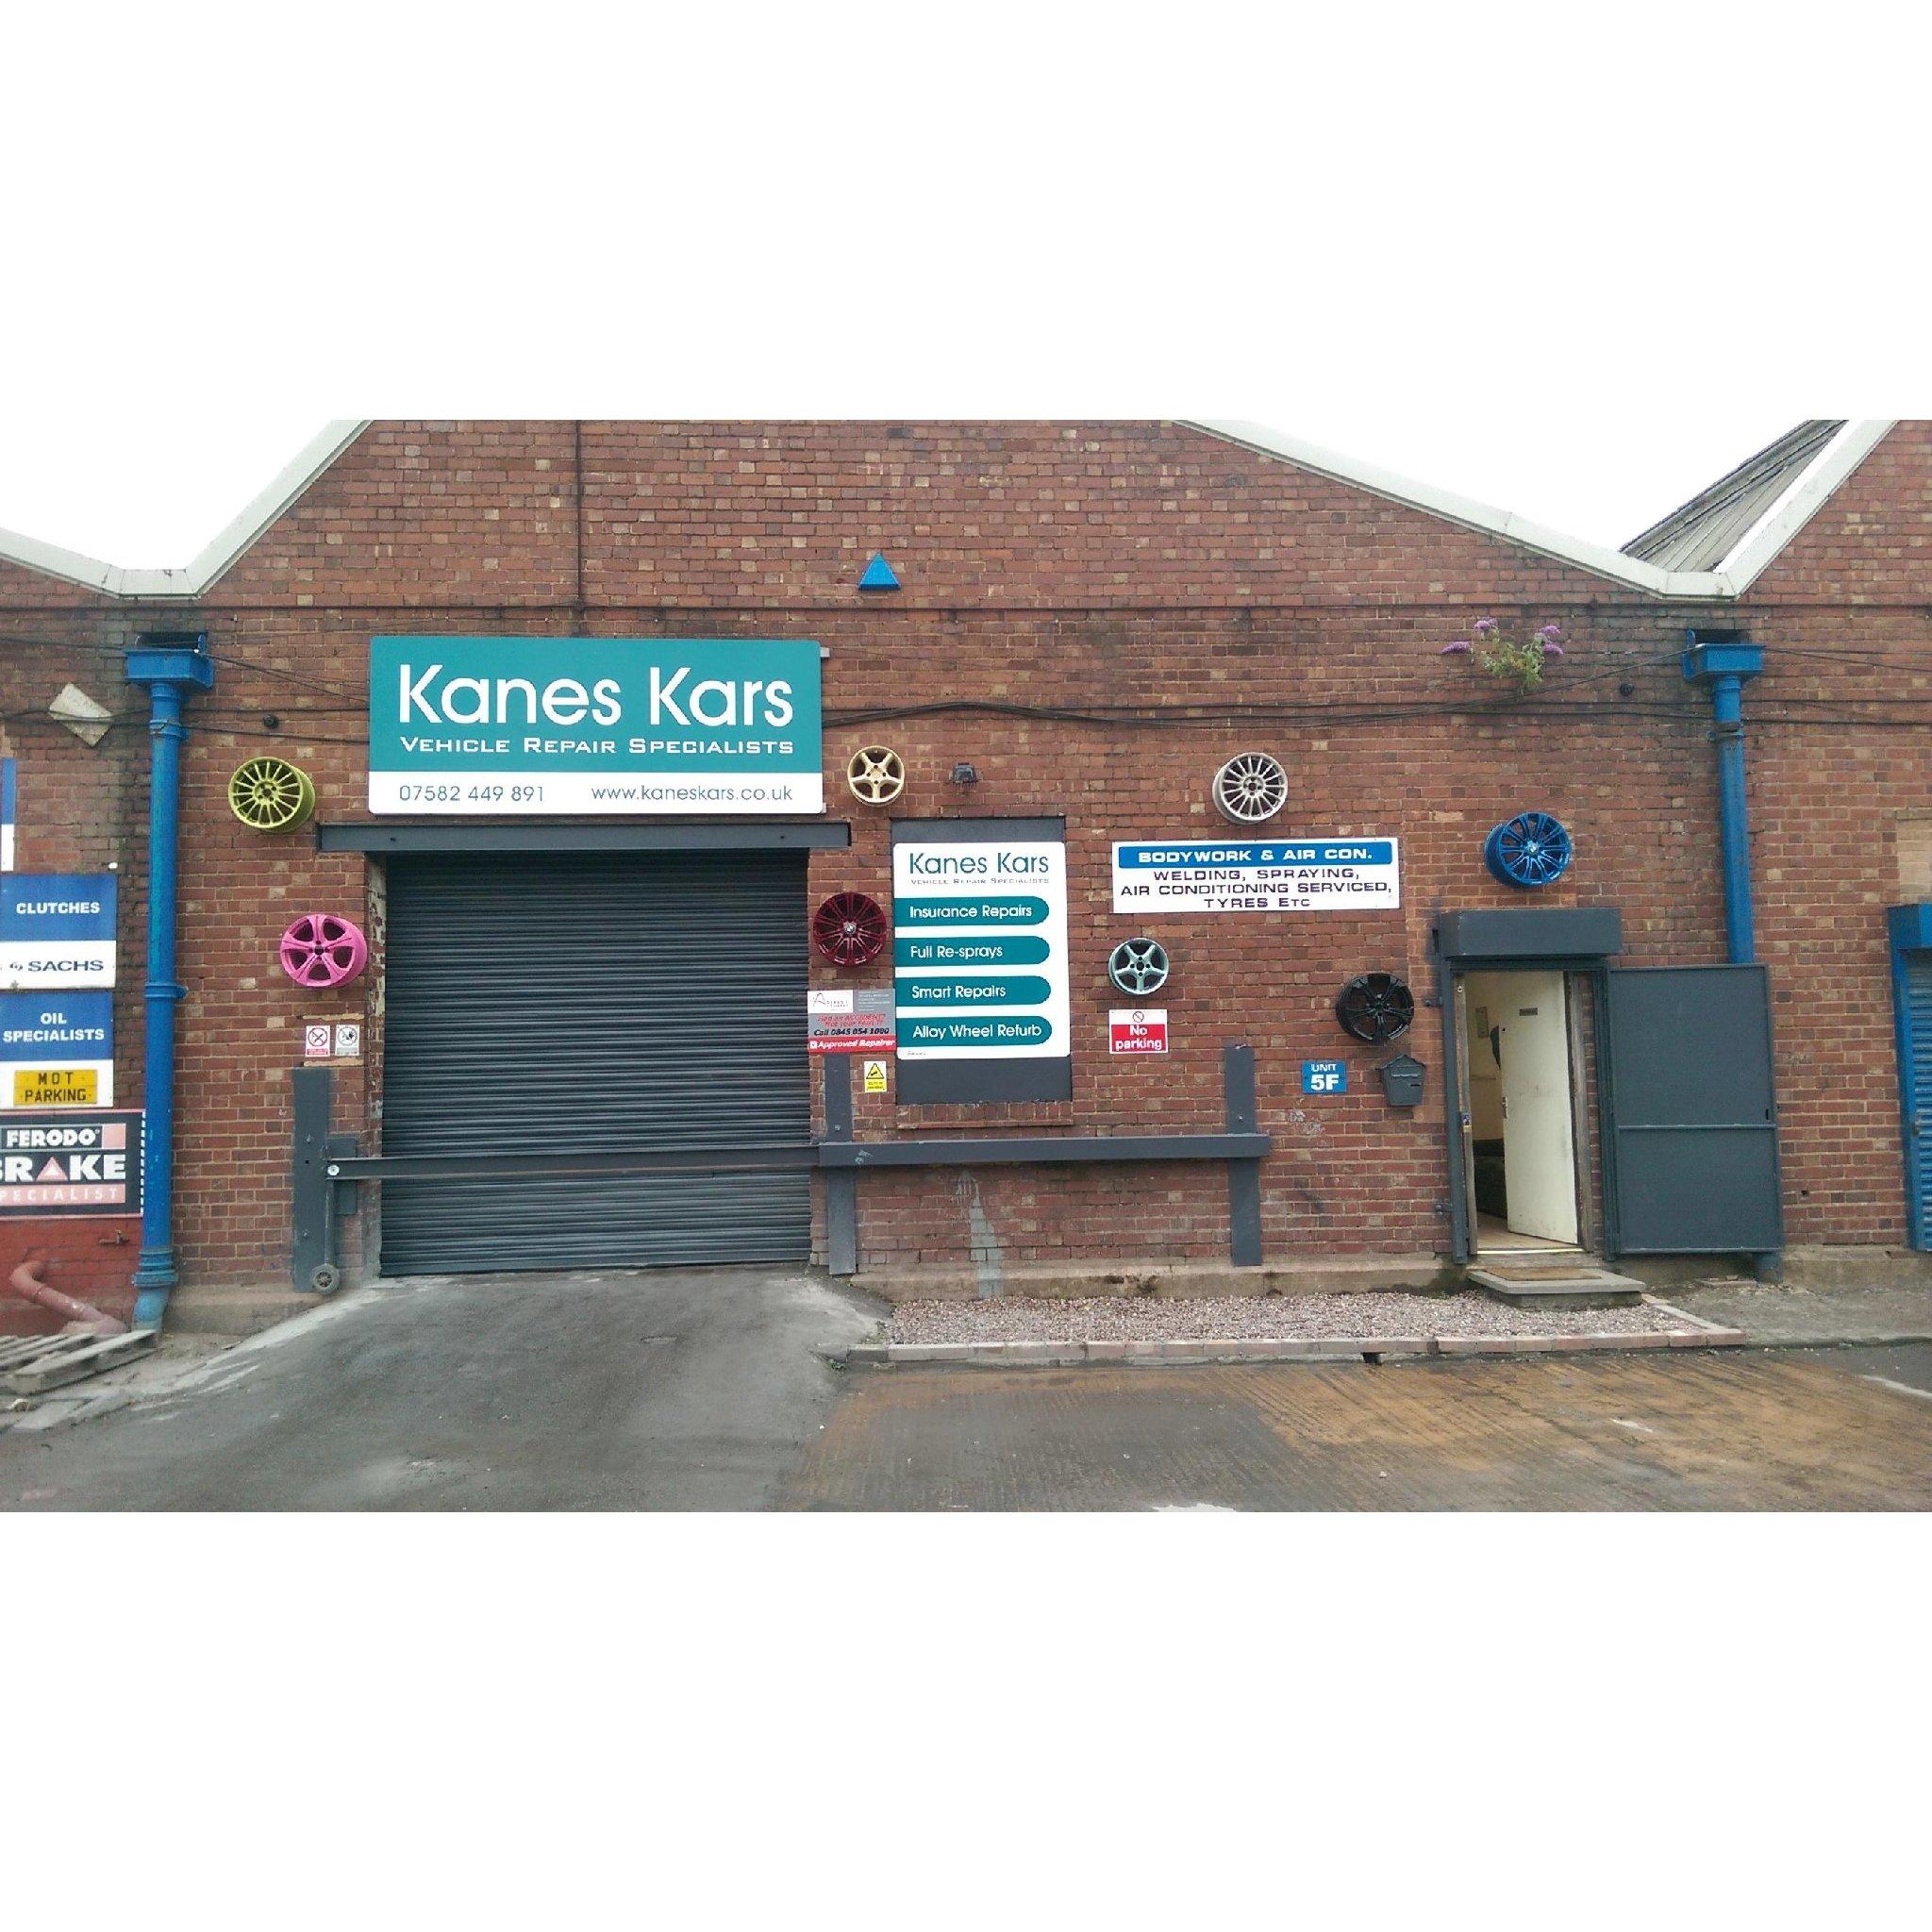 Kanes Kars - Bilston, West Midlands WV14 7HZ - 07582 449891 | ShowMeLocal.com